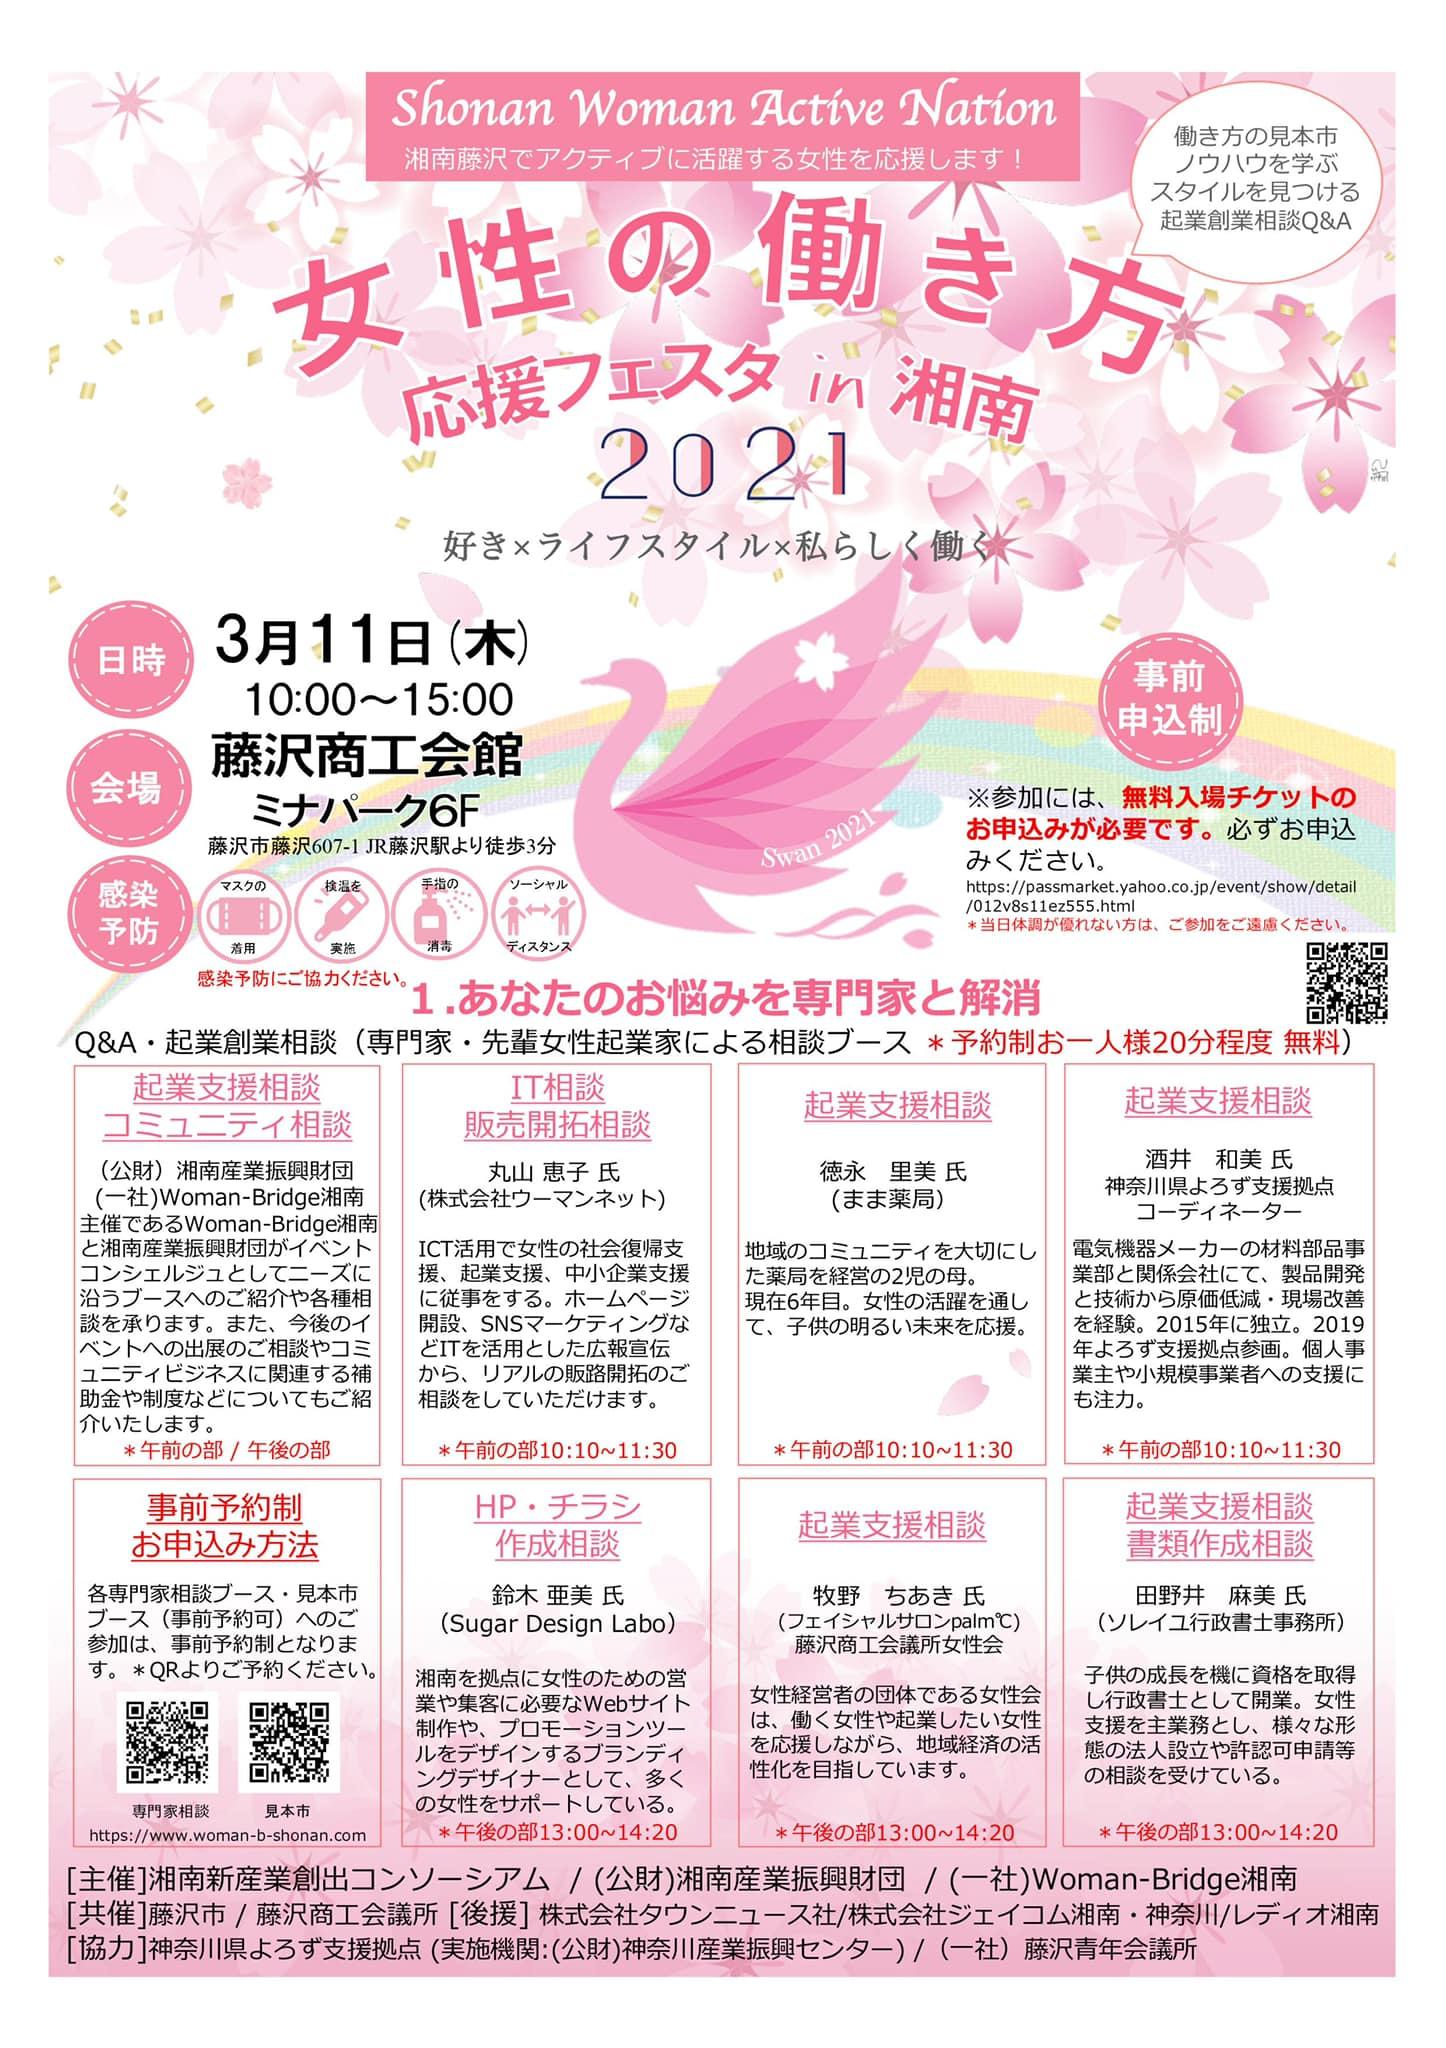 3/11『SHONAN WOMAN ACTIVE NATION 2021』〜湘南藤沢でアクティブに活躍する女性を応援〜